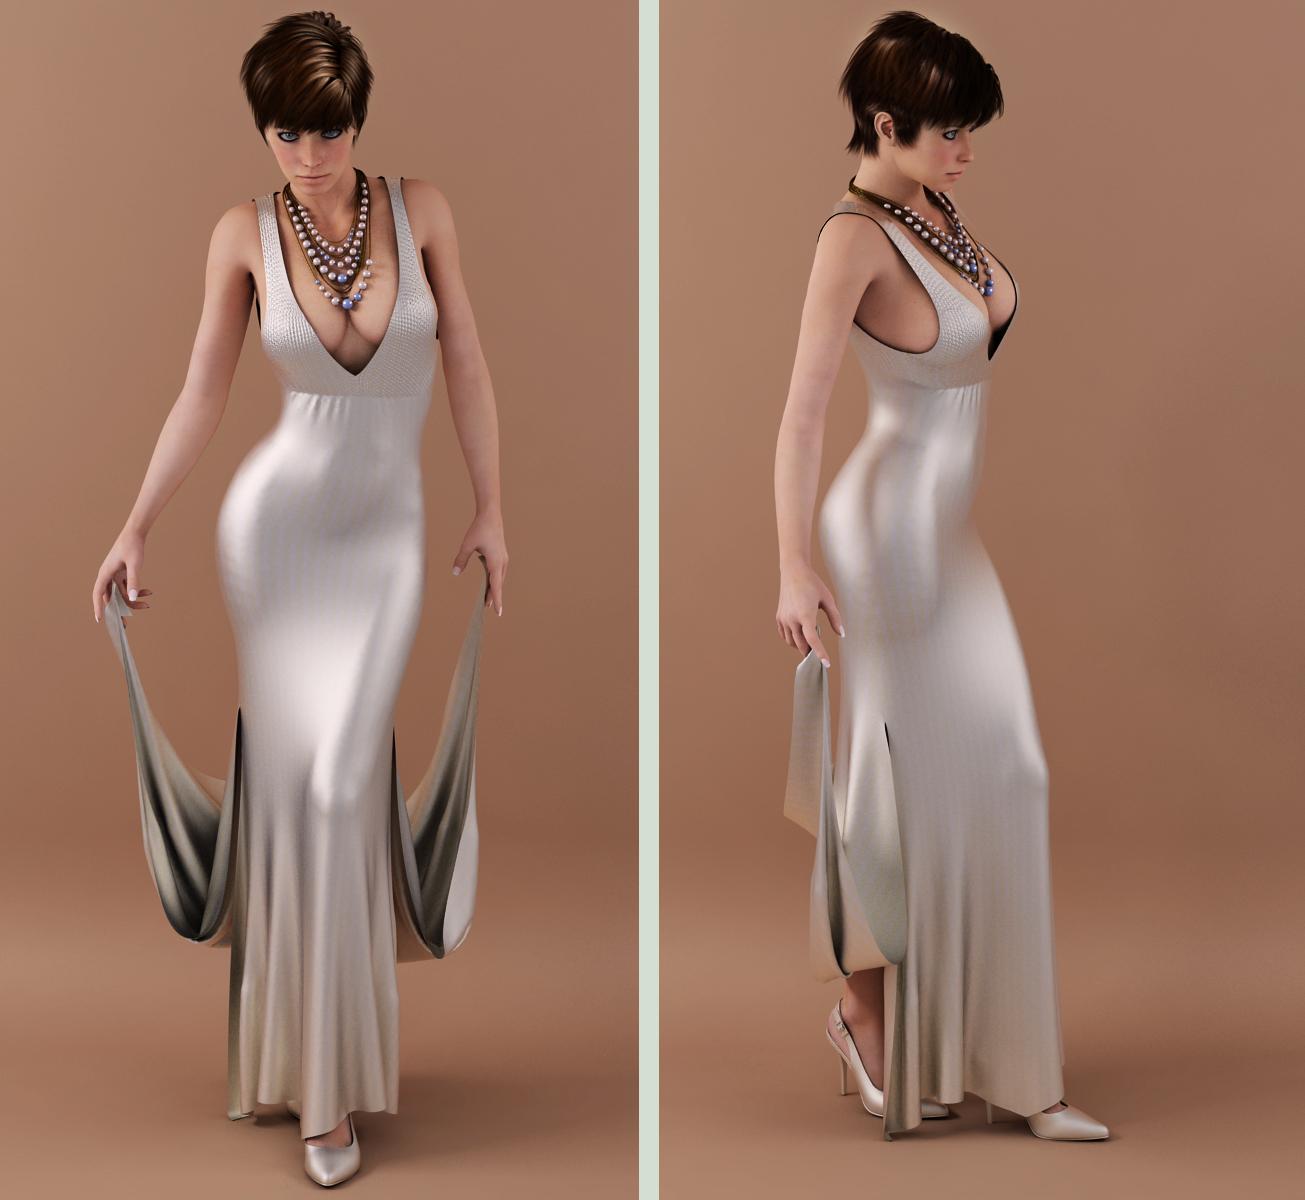 long dress drape 04 by SaphireNishi